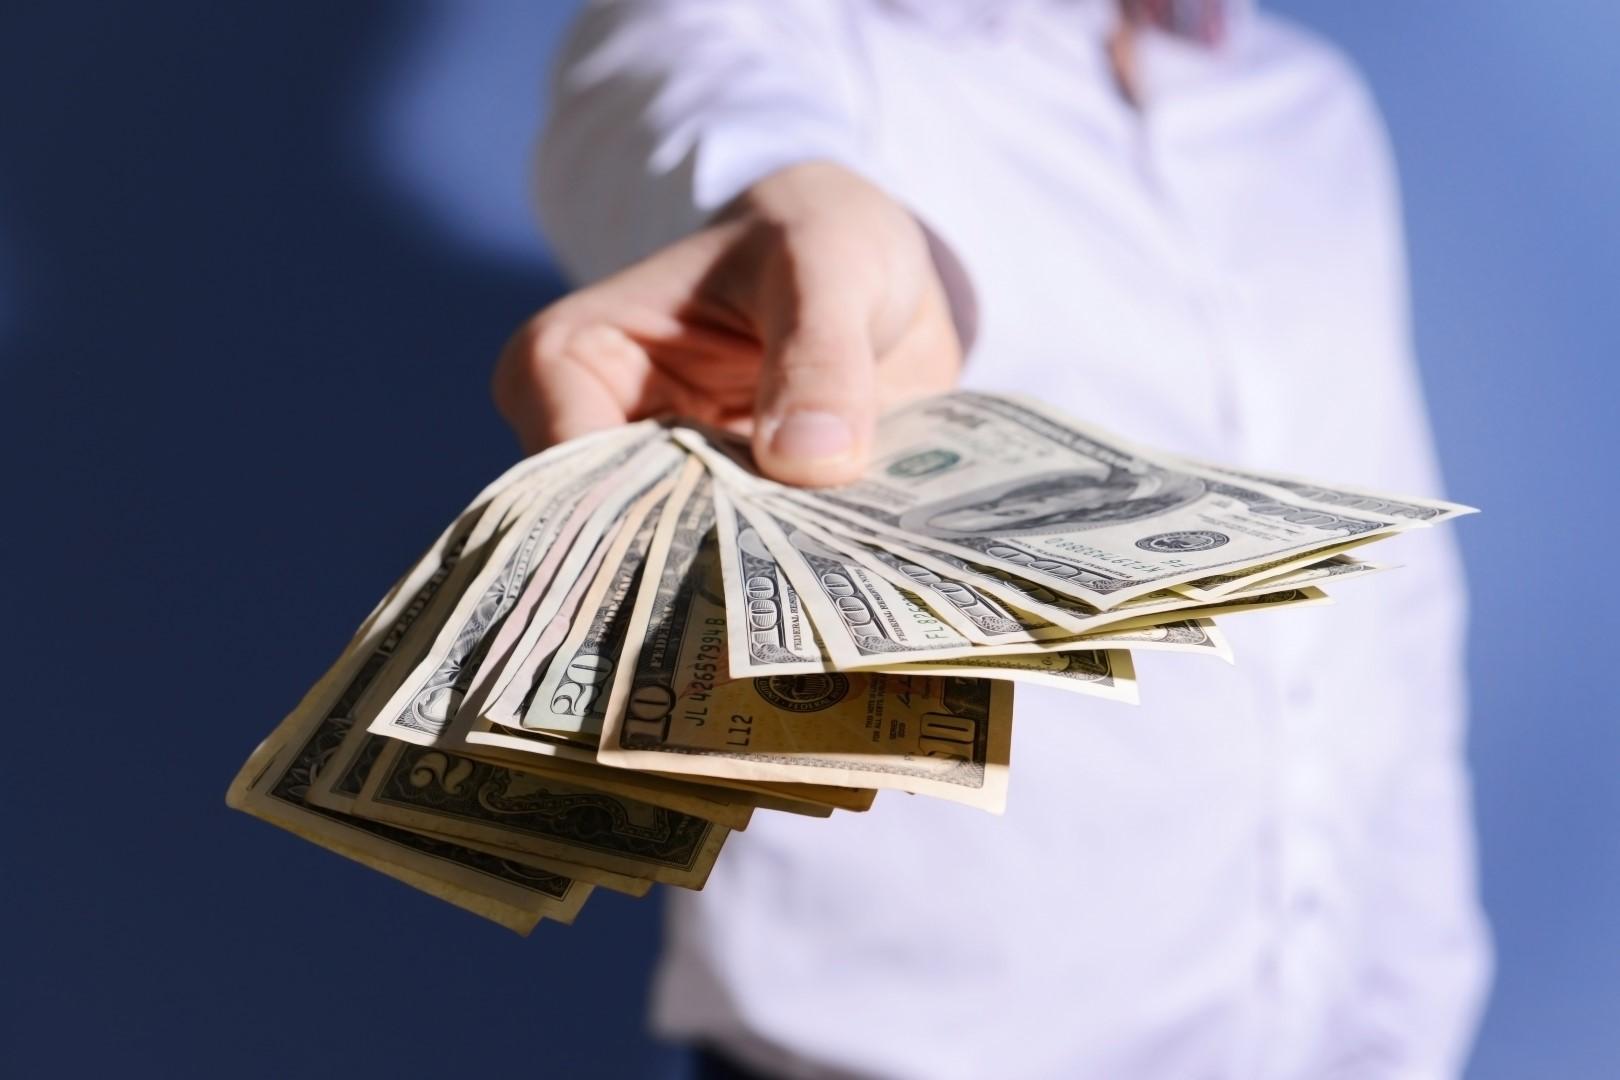 money-giving-donations-fundraising-Large.jpg